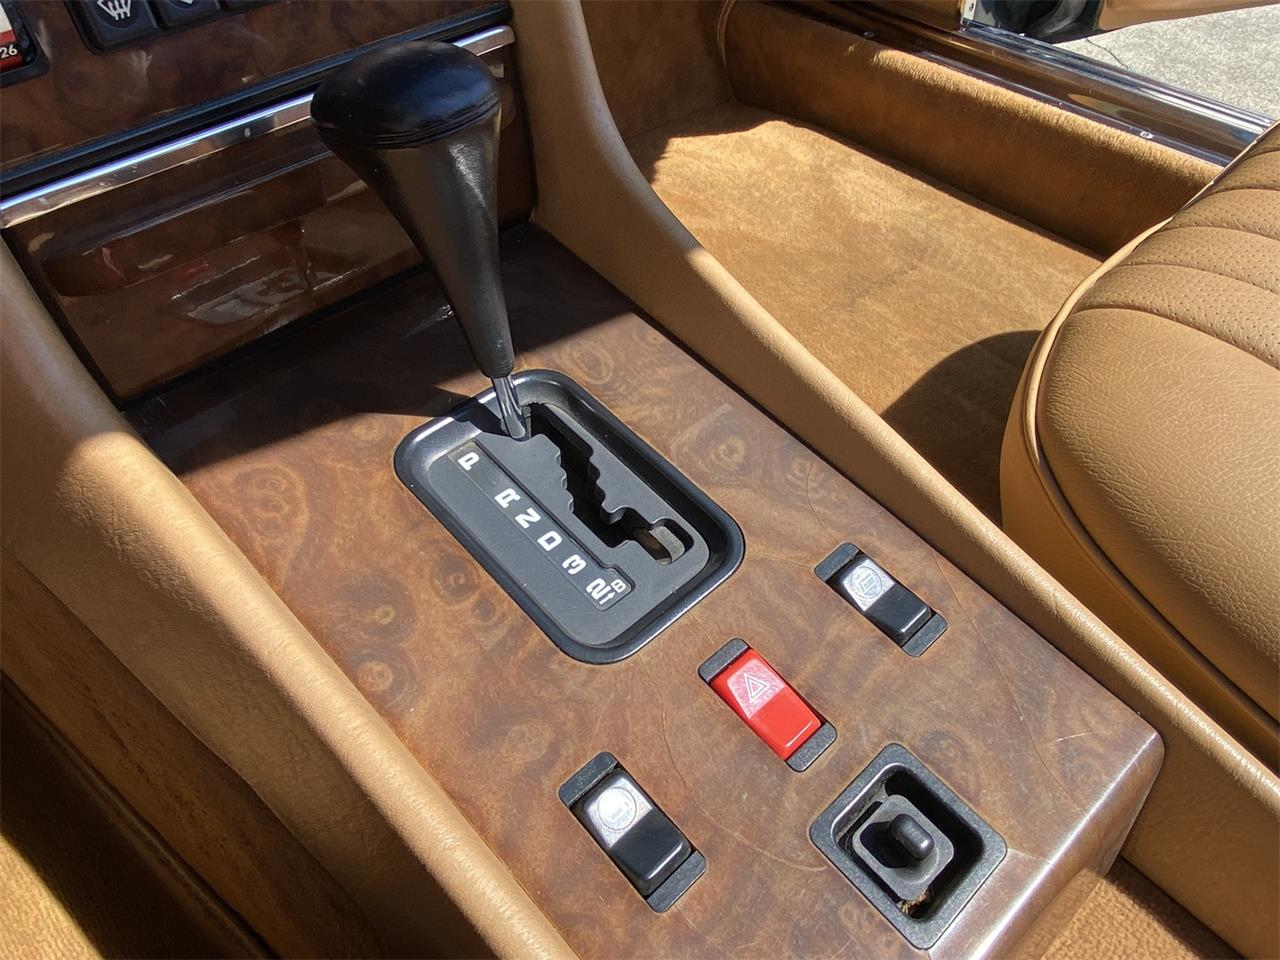 1987 Mercedes-Benz 560SL (CC-1379172) for sale in Fairfield, California